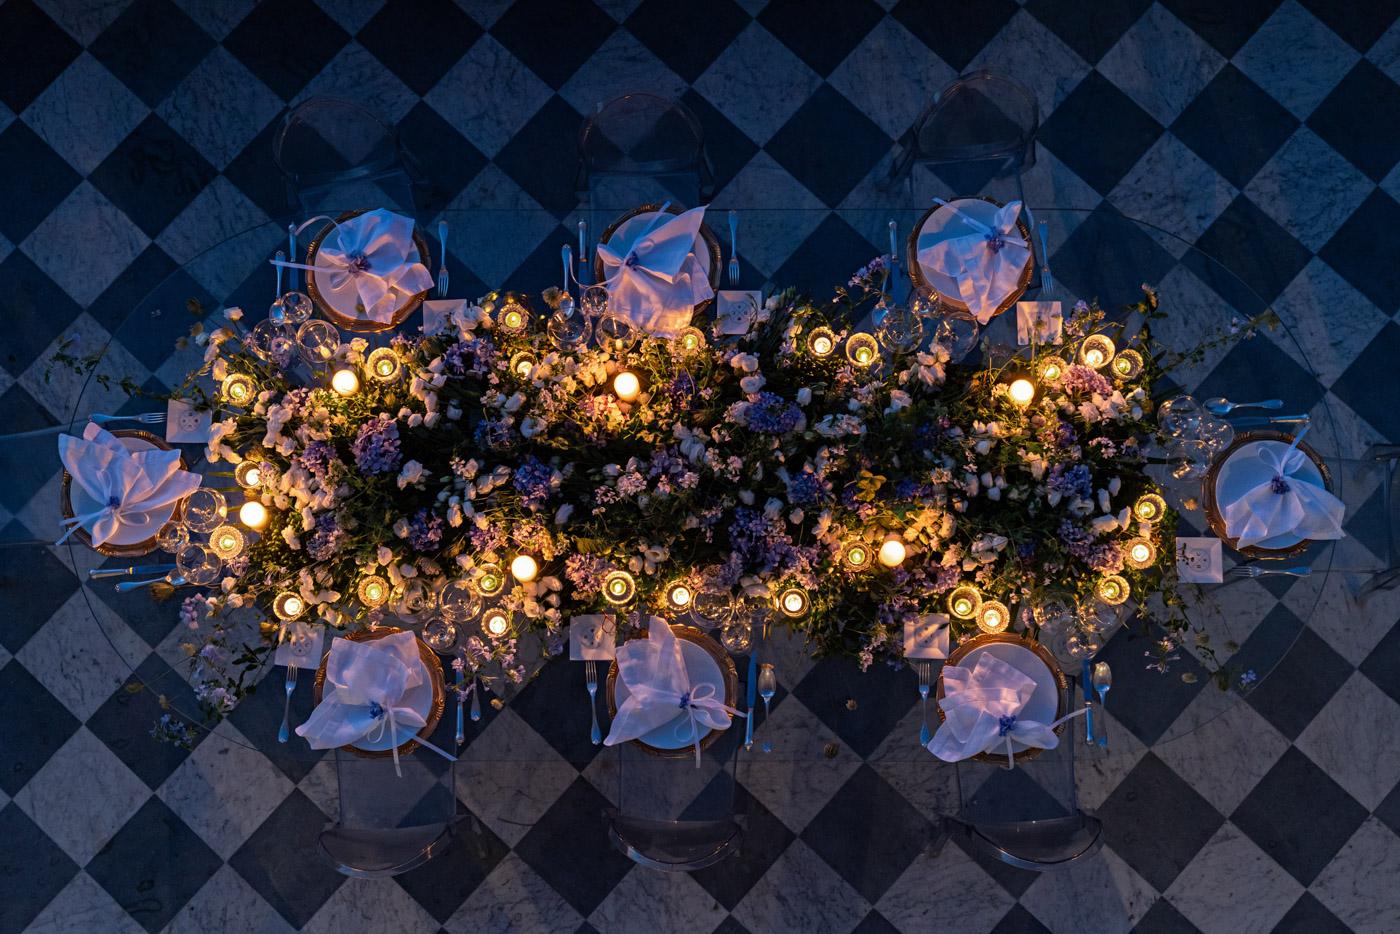 Candlelit wedding tablescape designed by Eddie Zaratsian at Villa Astor, Sorrento, Italy - photo by Adagion Studio